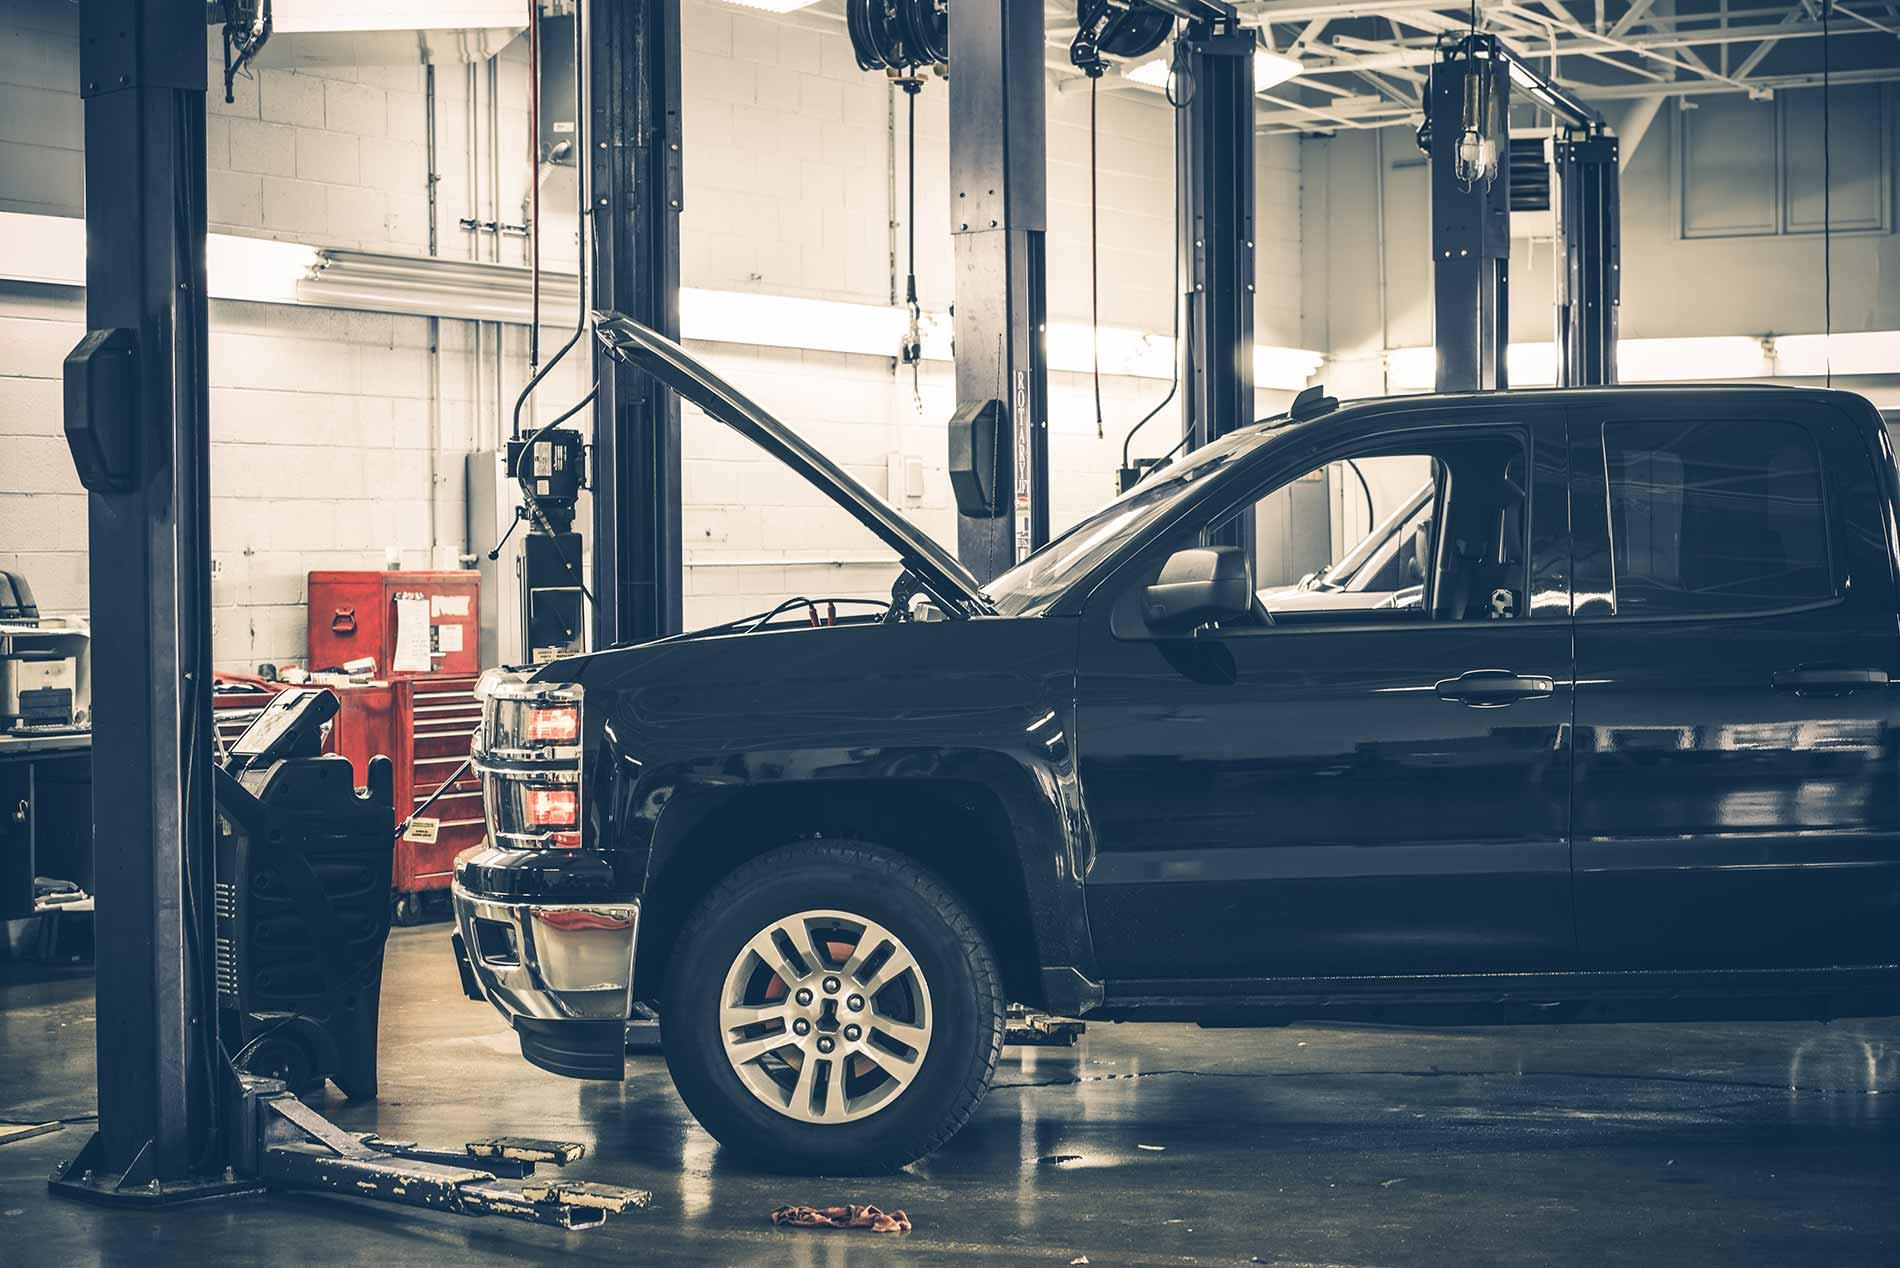 featuredimage-Auto-Repairs-and-Maintenance-in-Kamloops